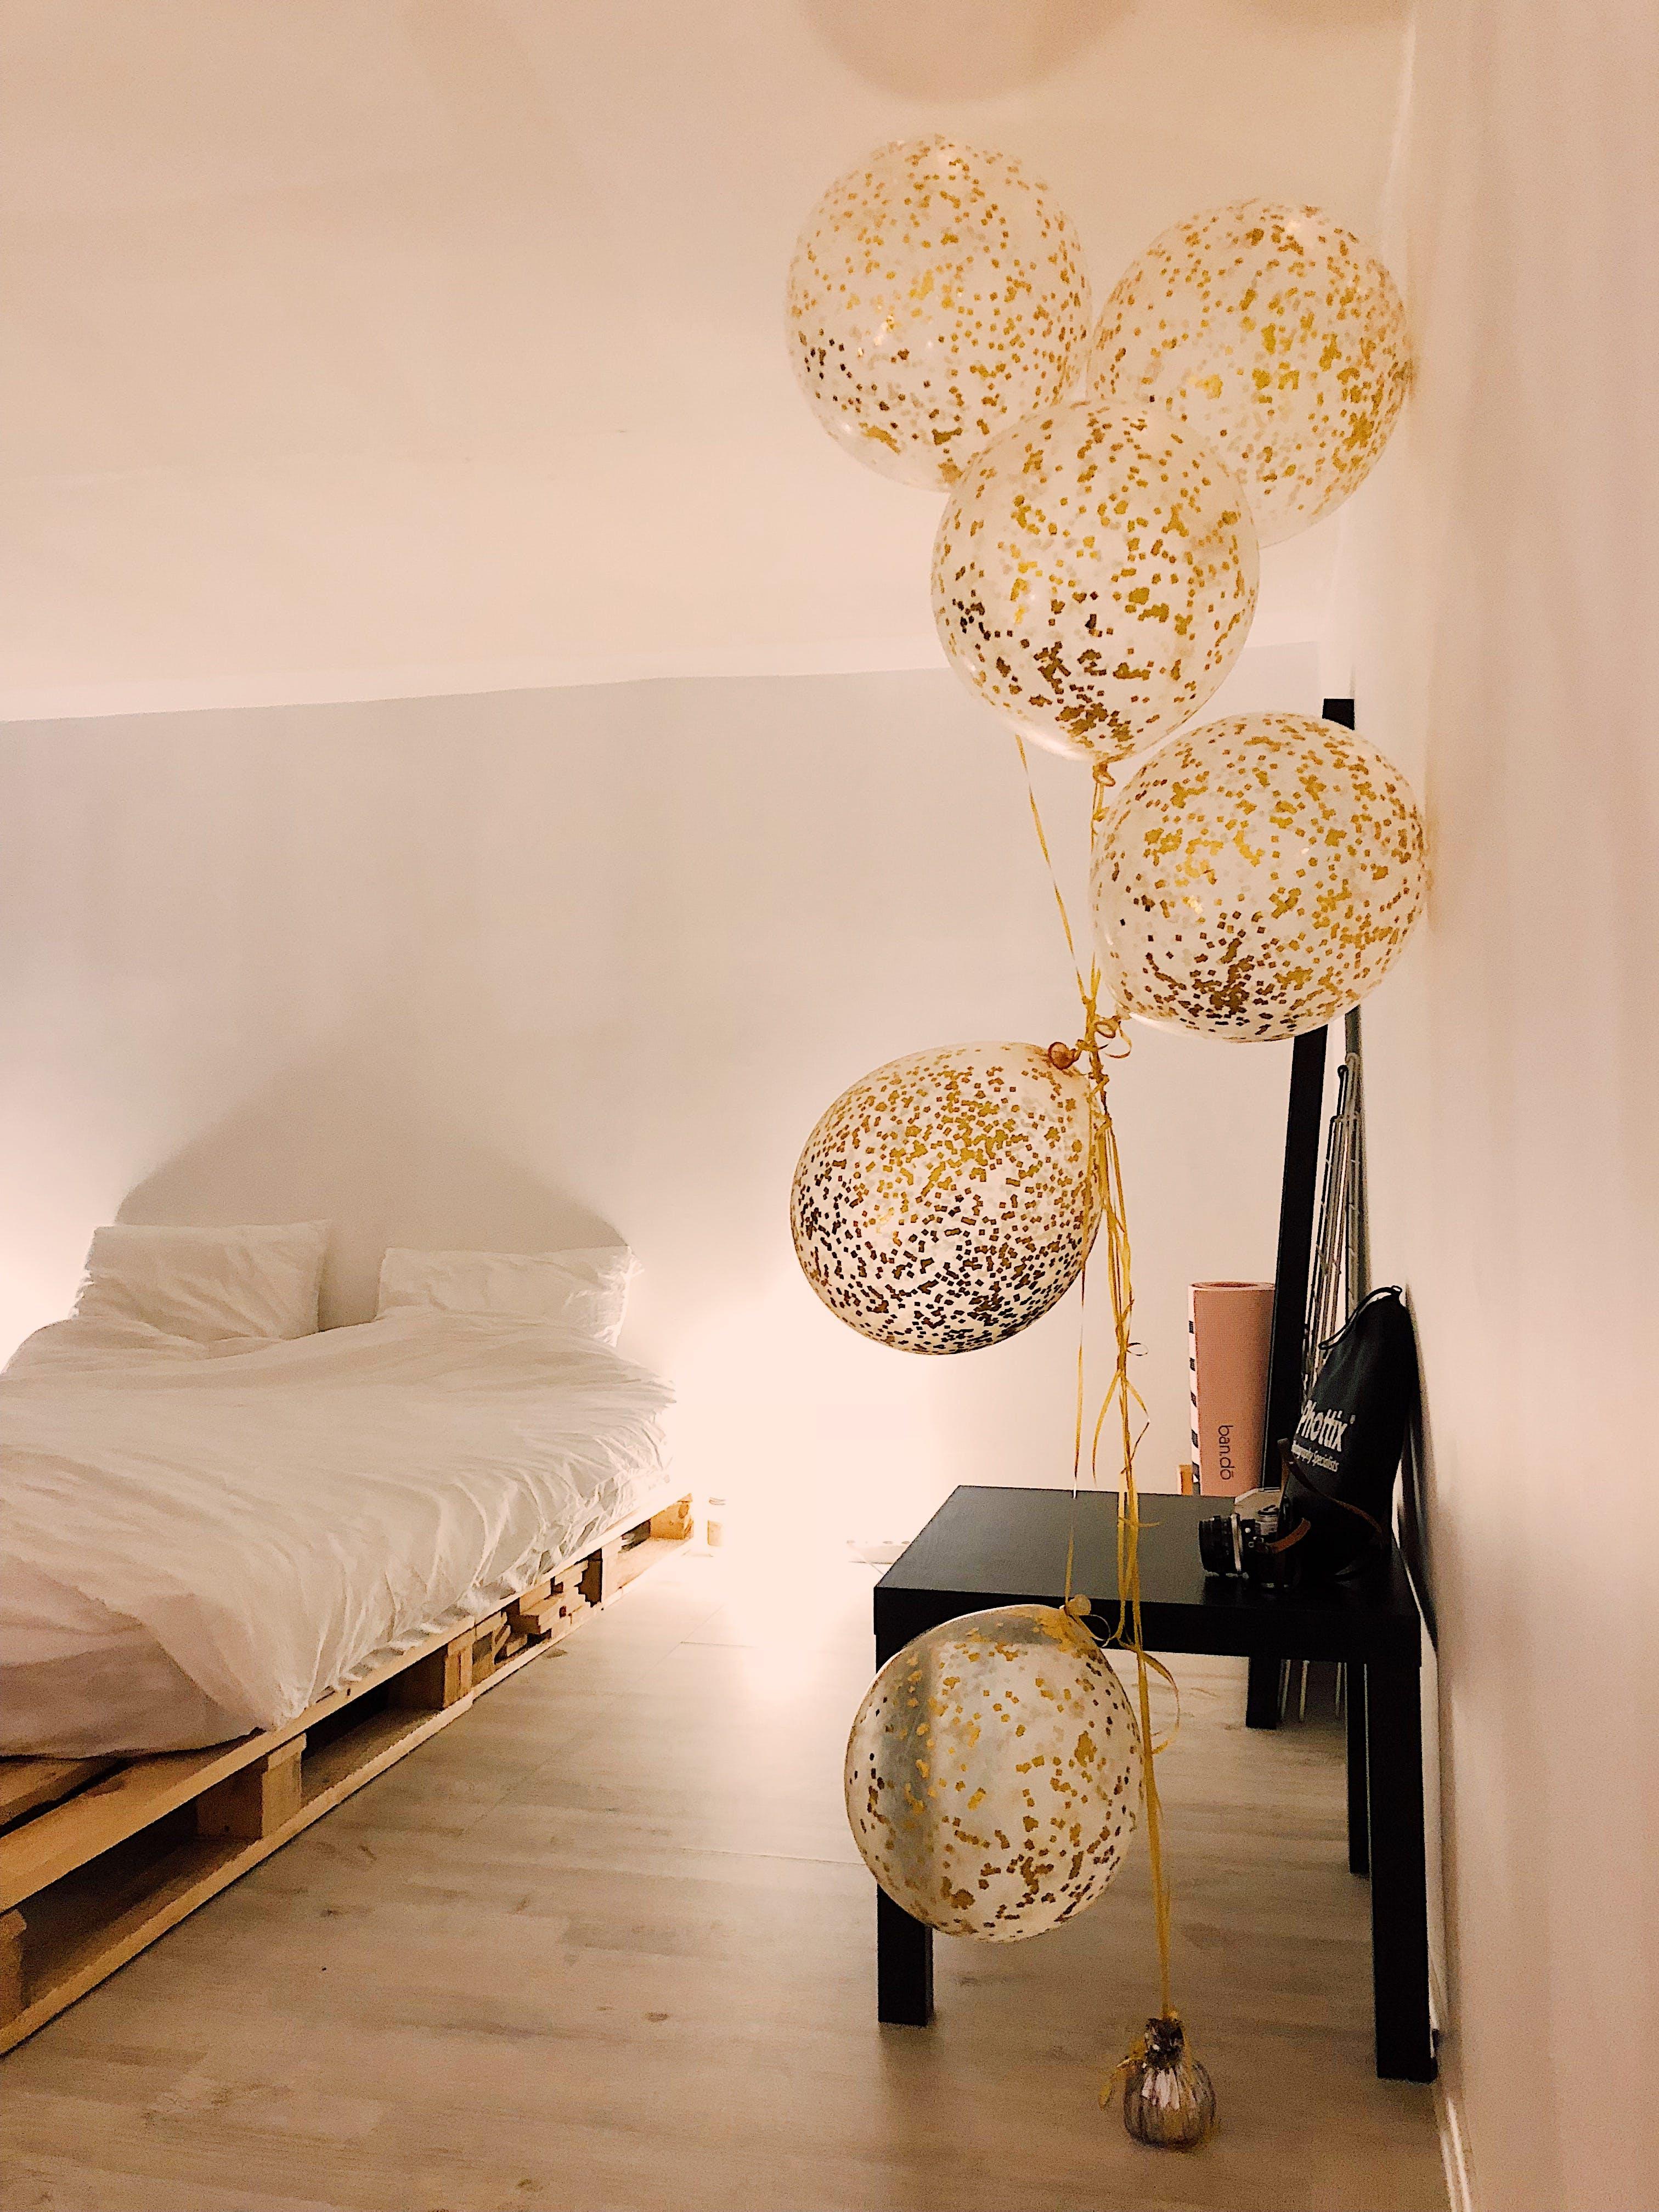 Balloons Near White Bedspread Set